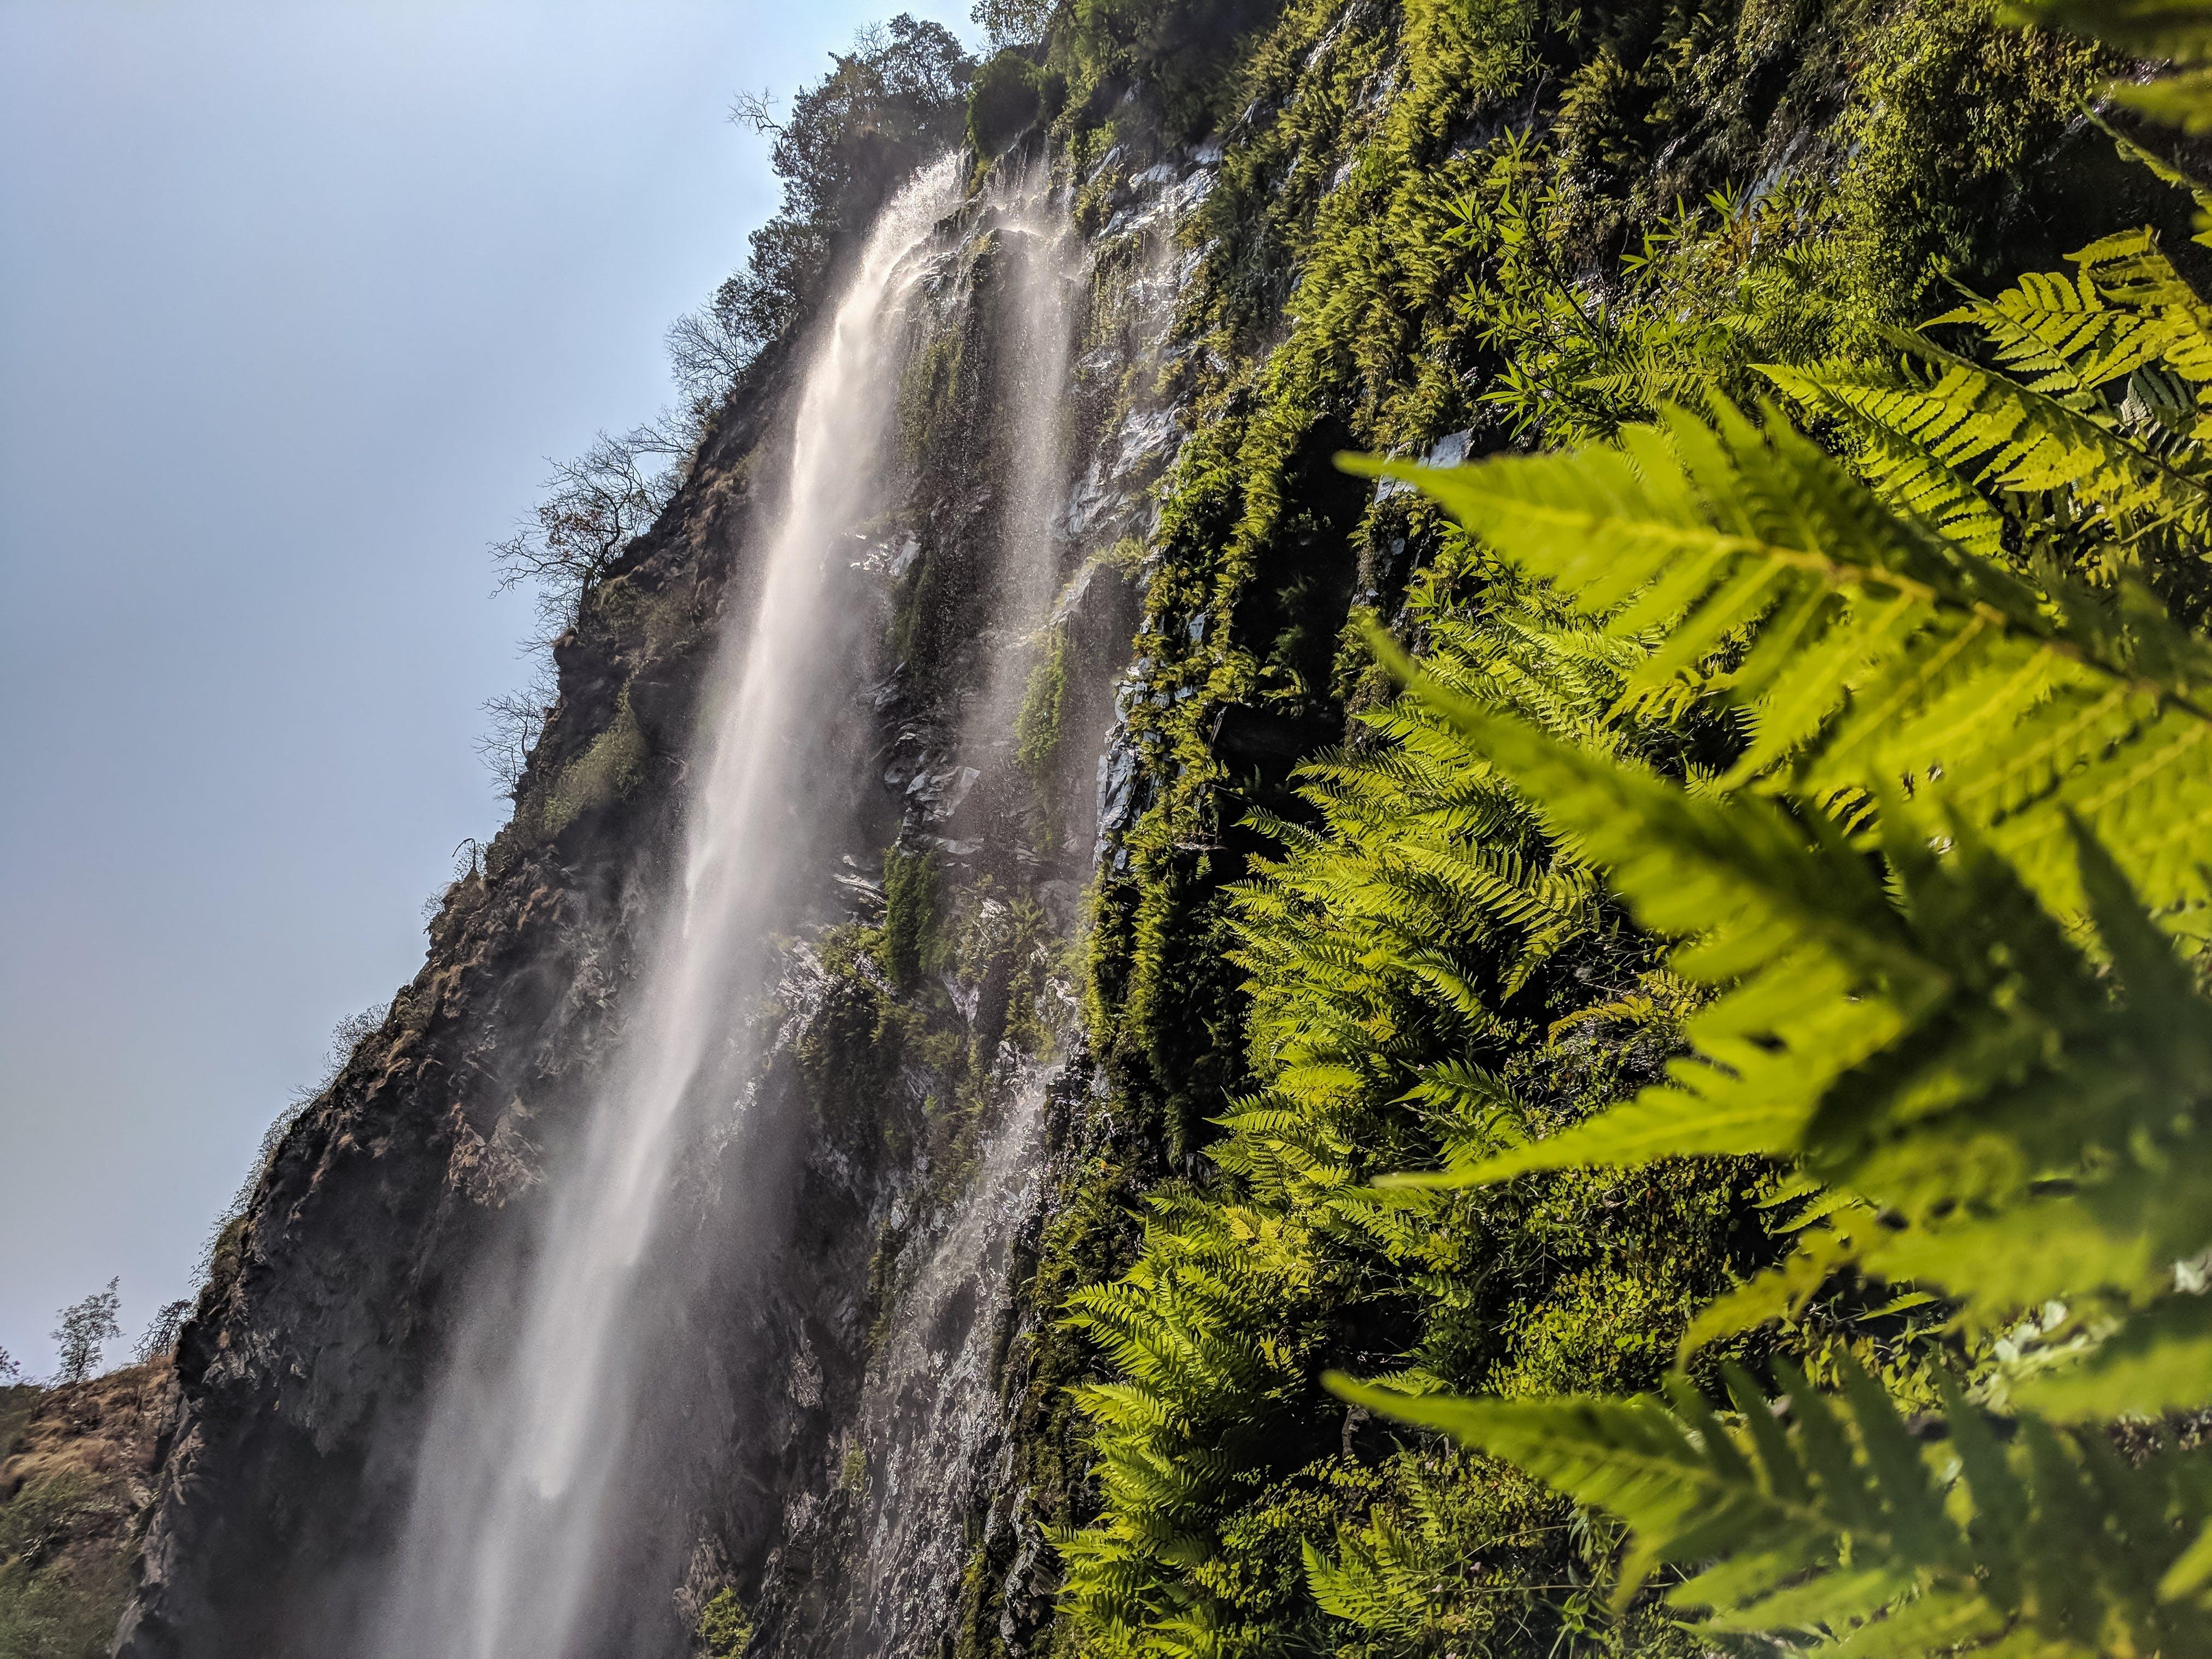 Kostenloses Stock Foto zu berg, fließen, kaskade, natur